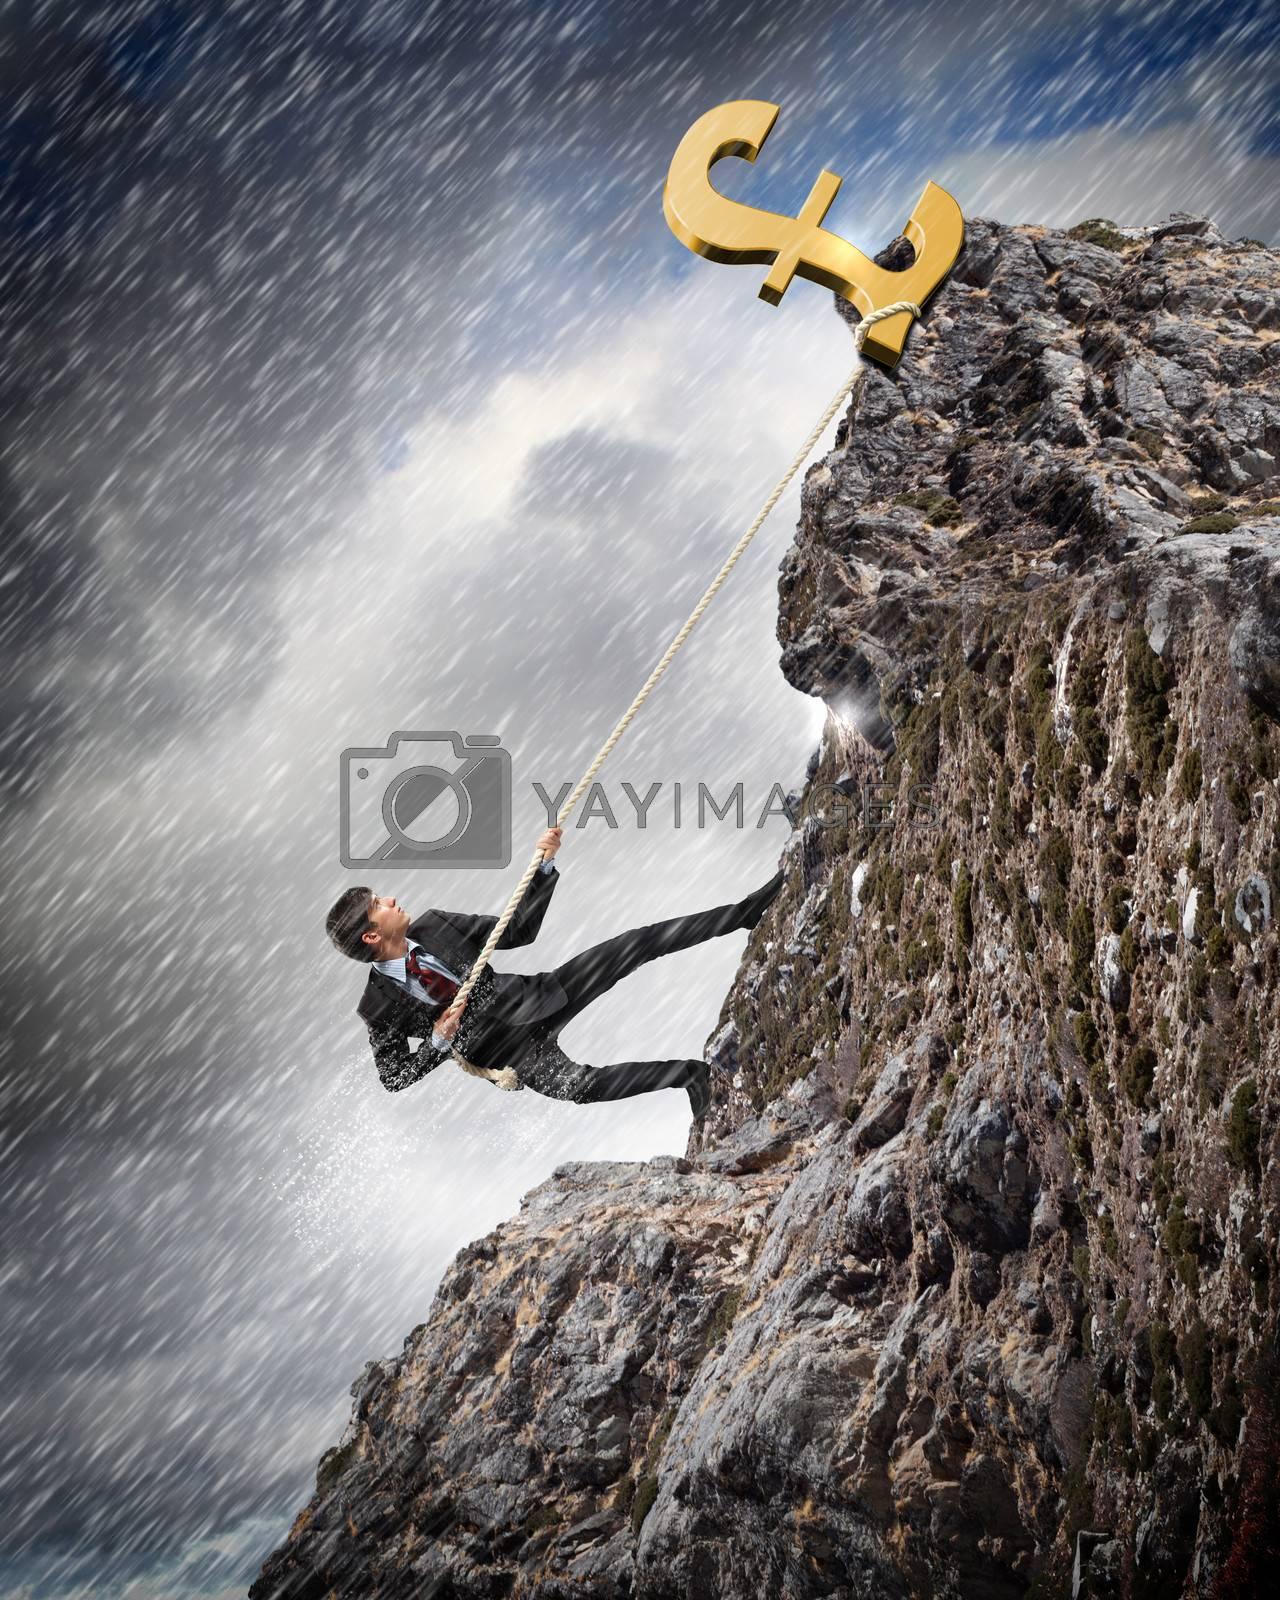 busiessman climbing mountain by Sergey Nivens